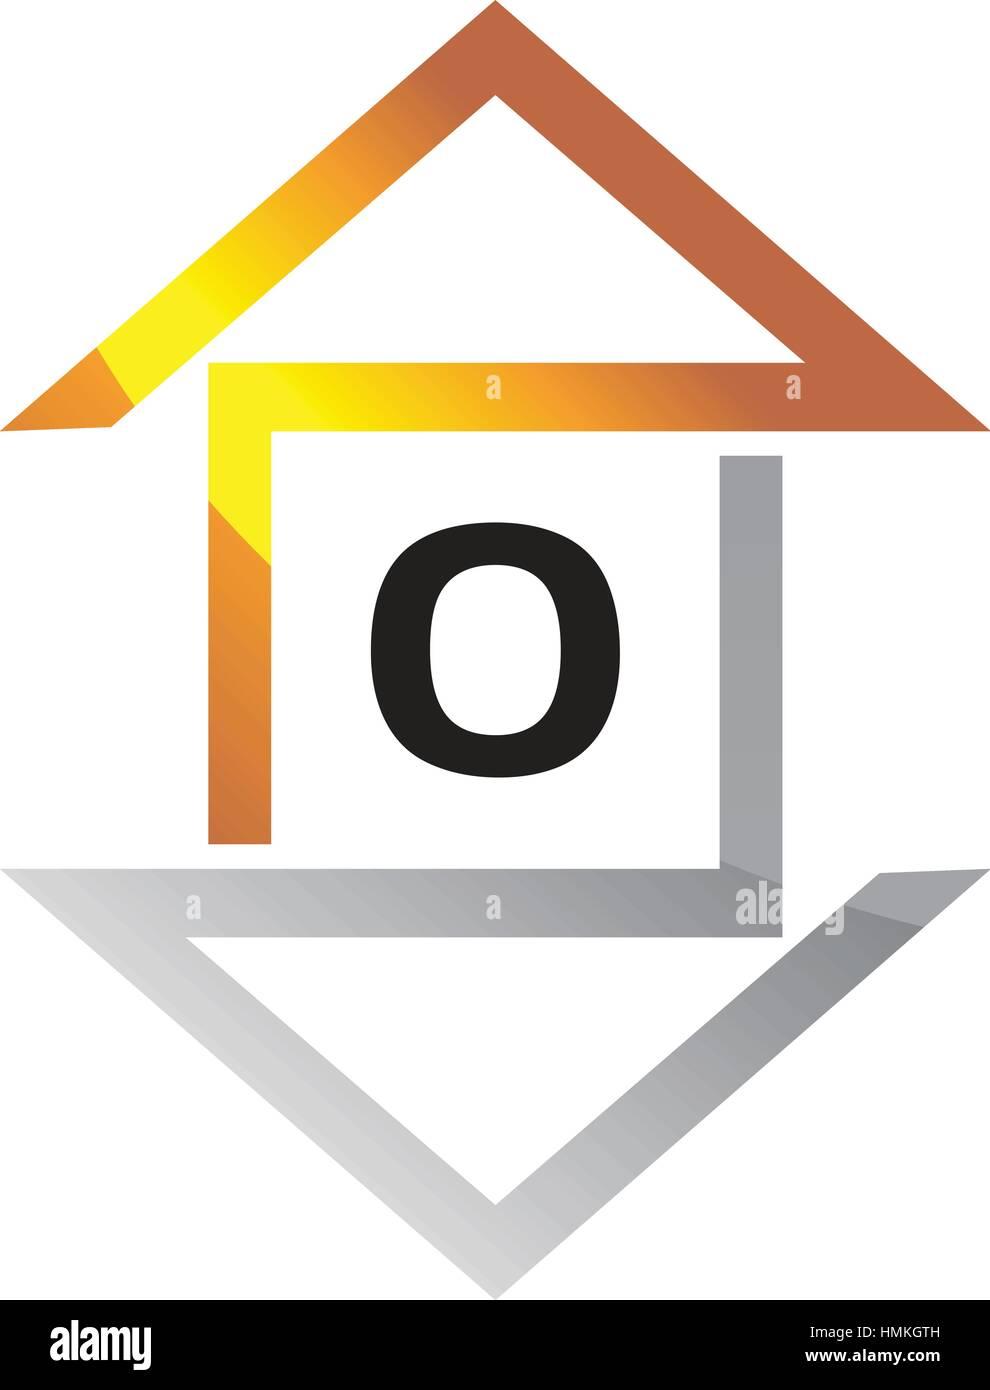 Real estate letter o stock vector art illustration vector image real estate letter o biocorpaavc